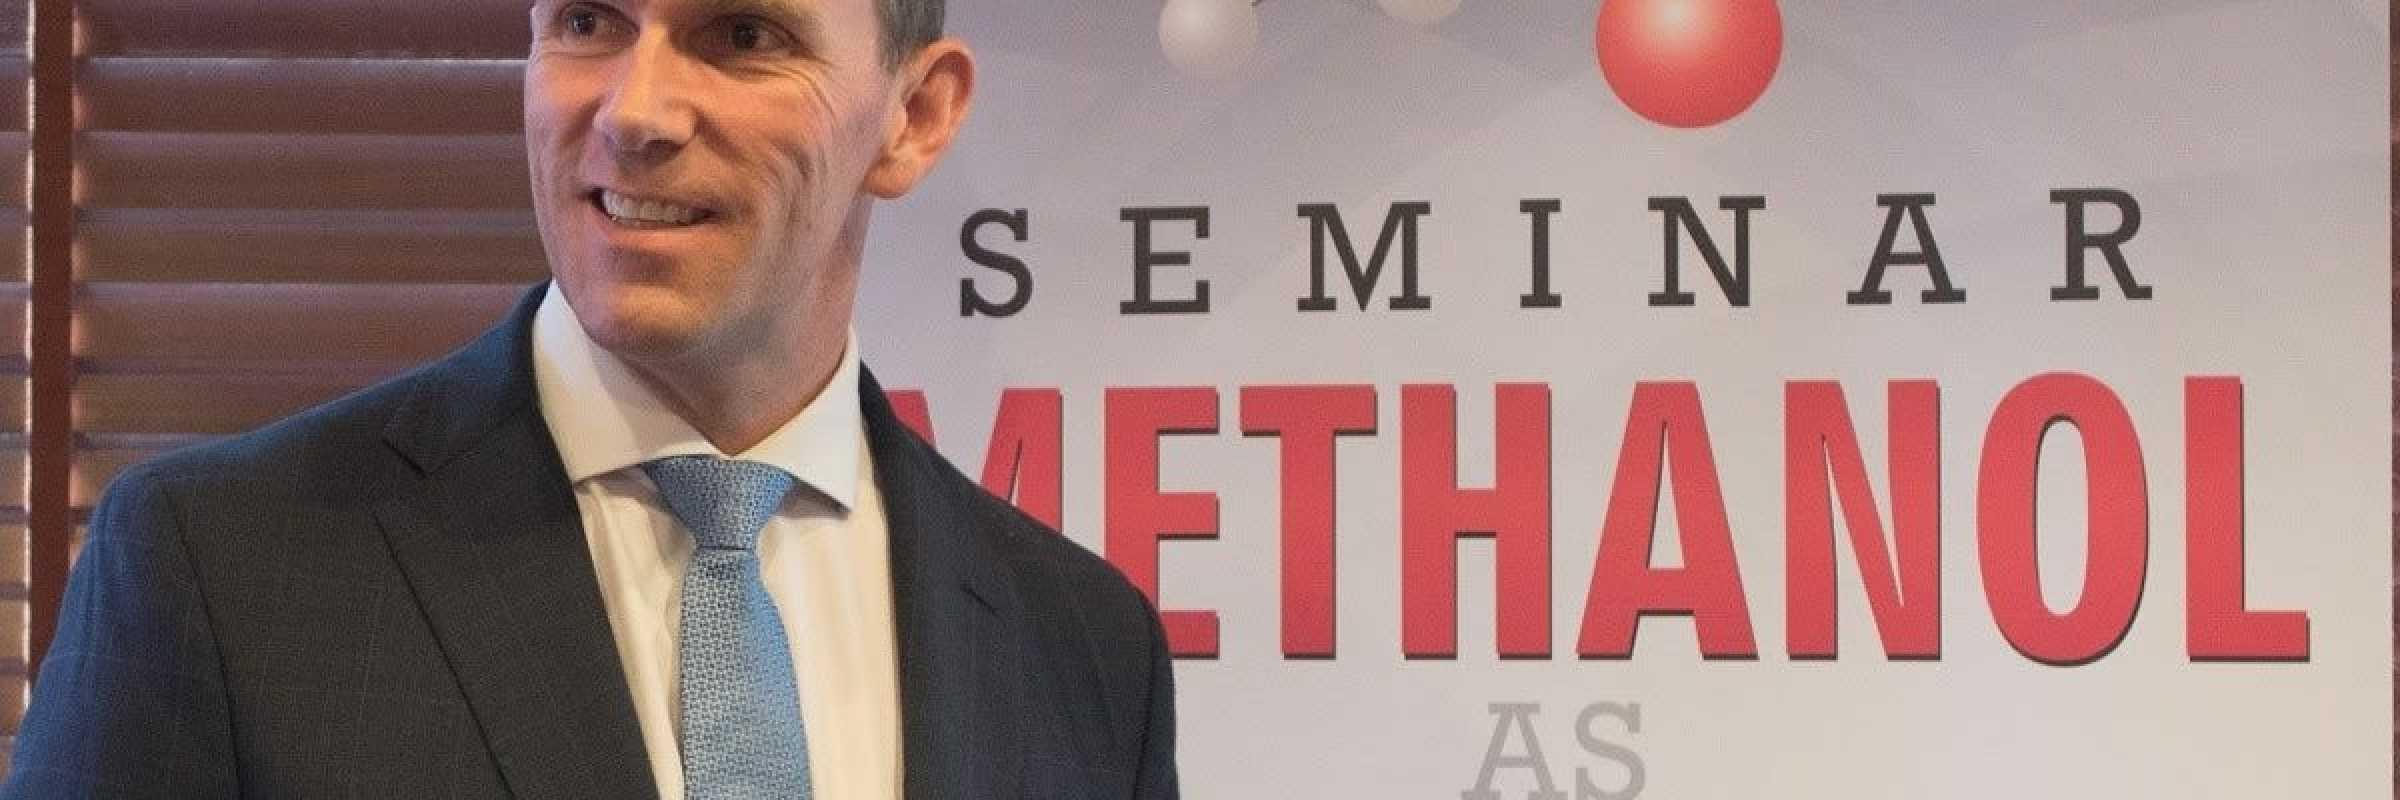 Seminar provides industry education on using methanol as fuel